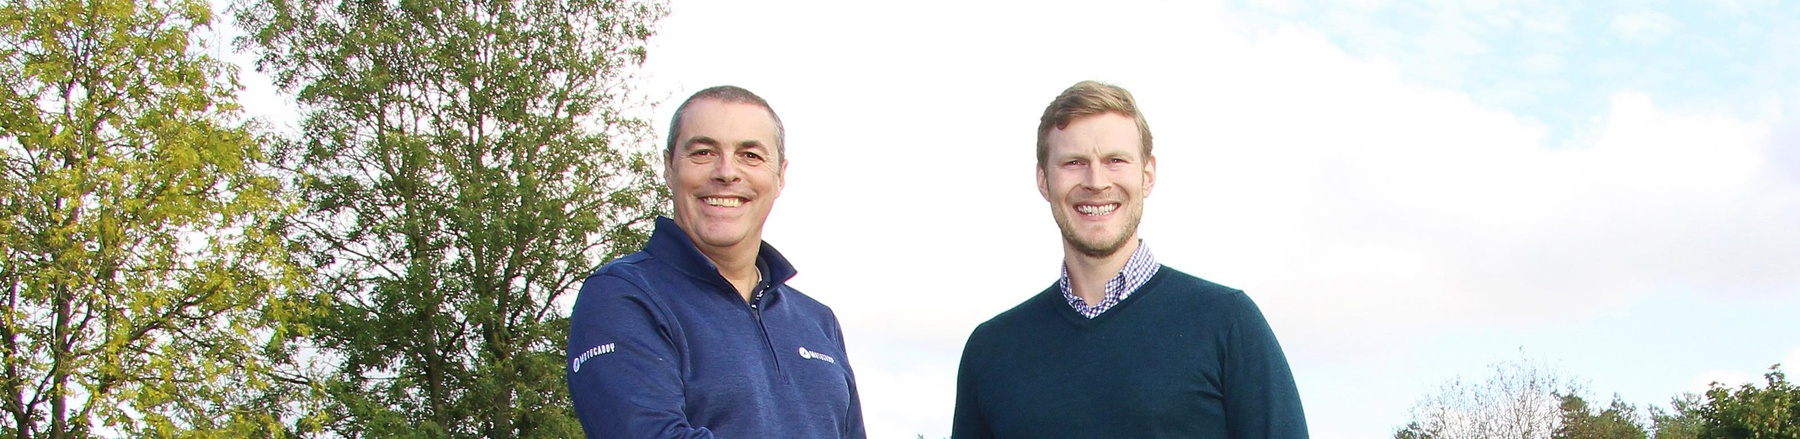 Sandy Farmer & John Helascrop